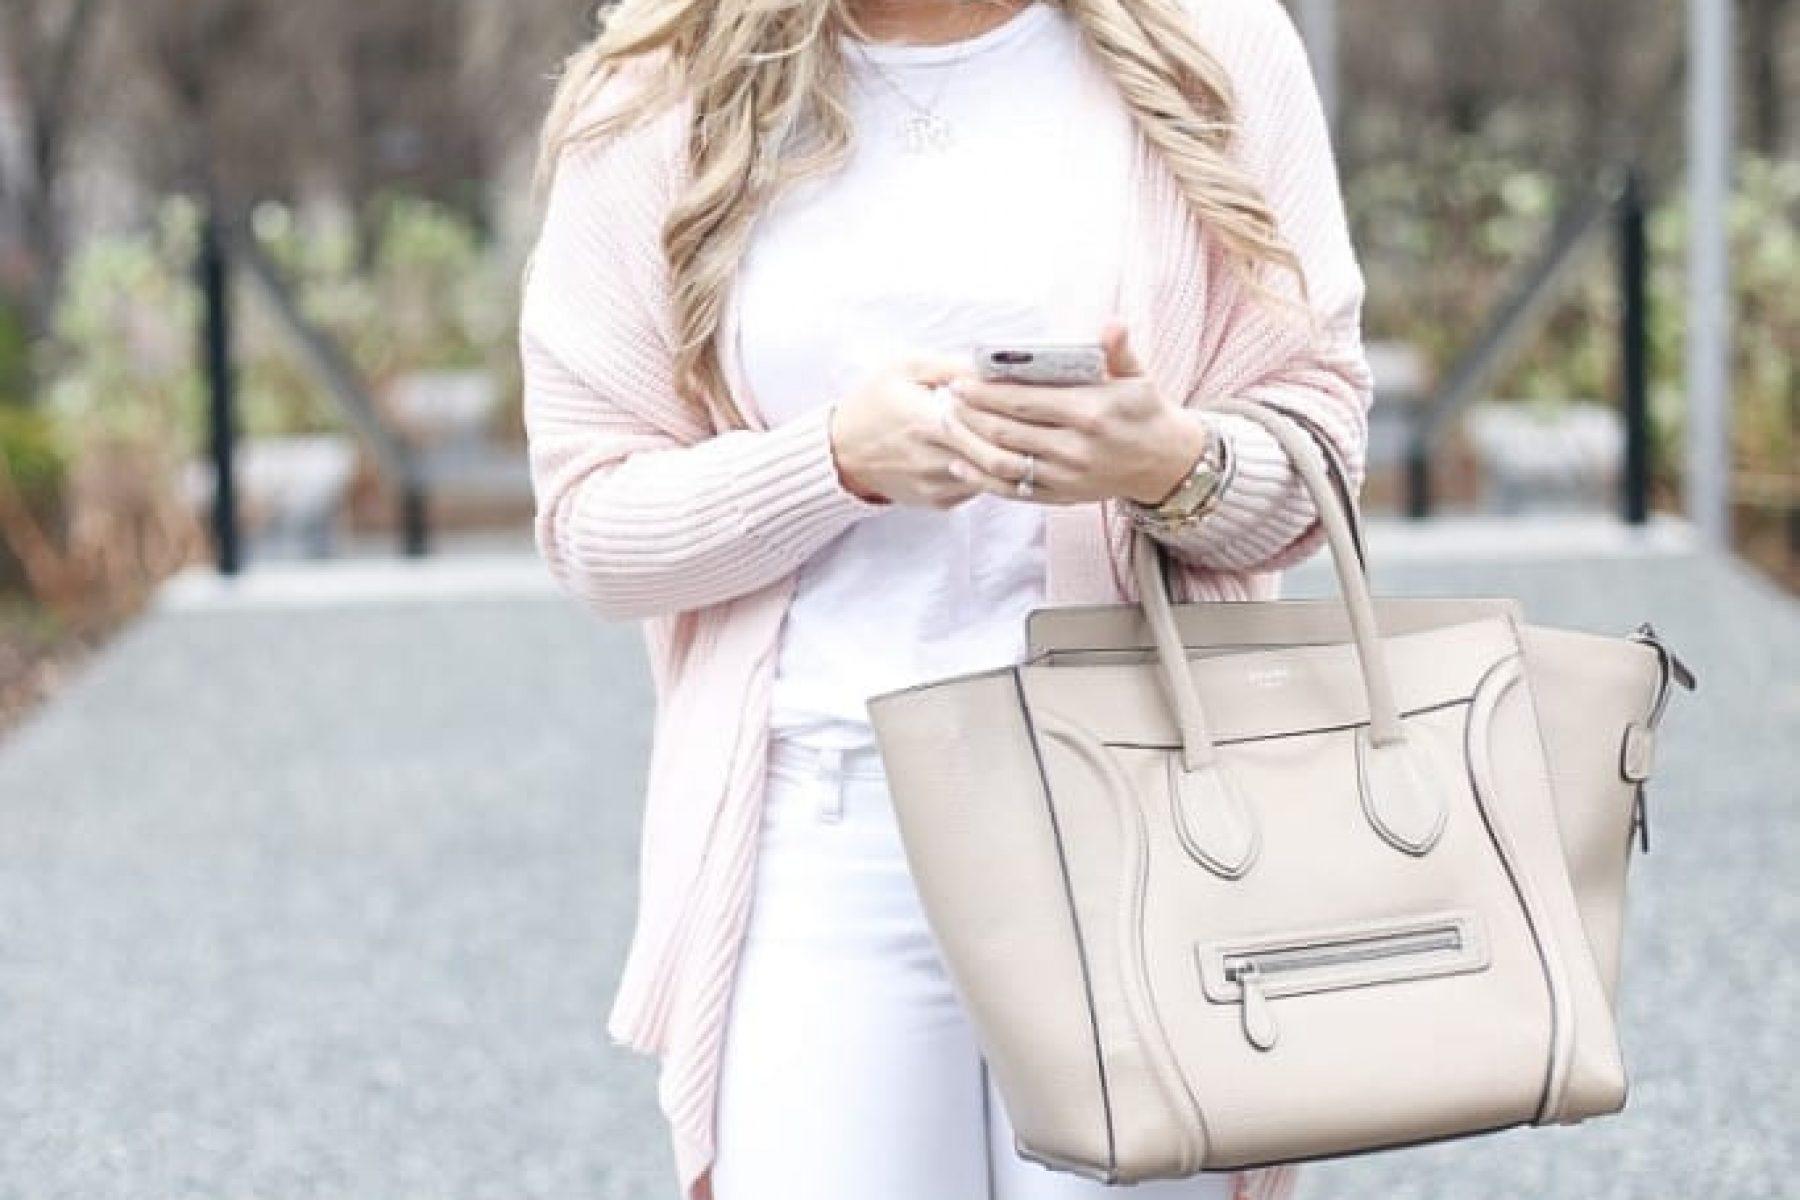 Blush-Cardigan-Pink-Urban-Outffiters-Classic-White-Denim-Celine Bag-1-2